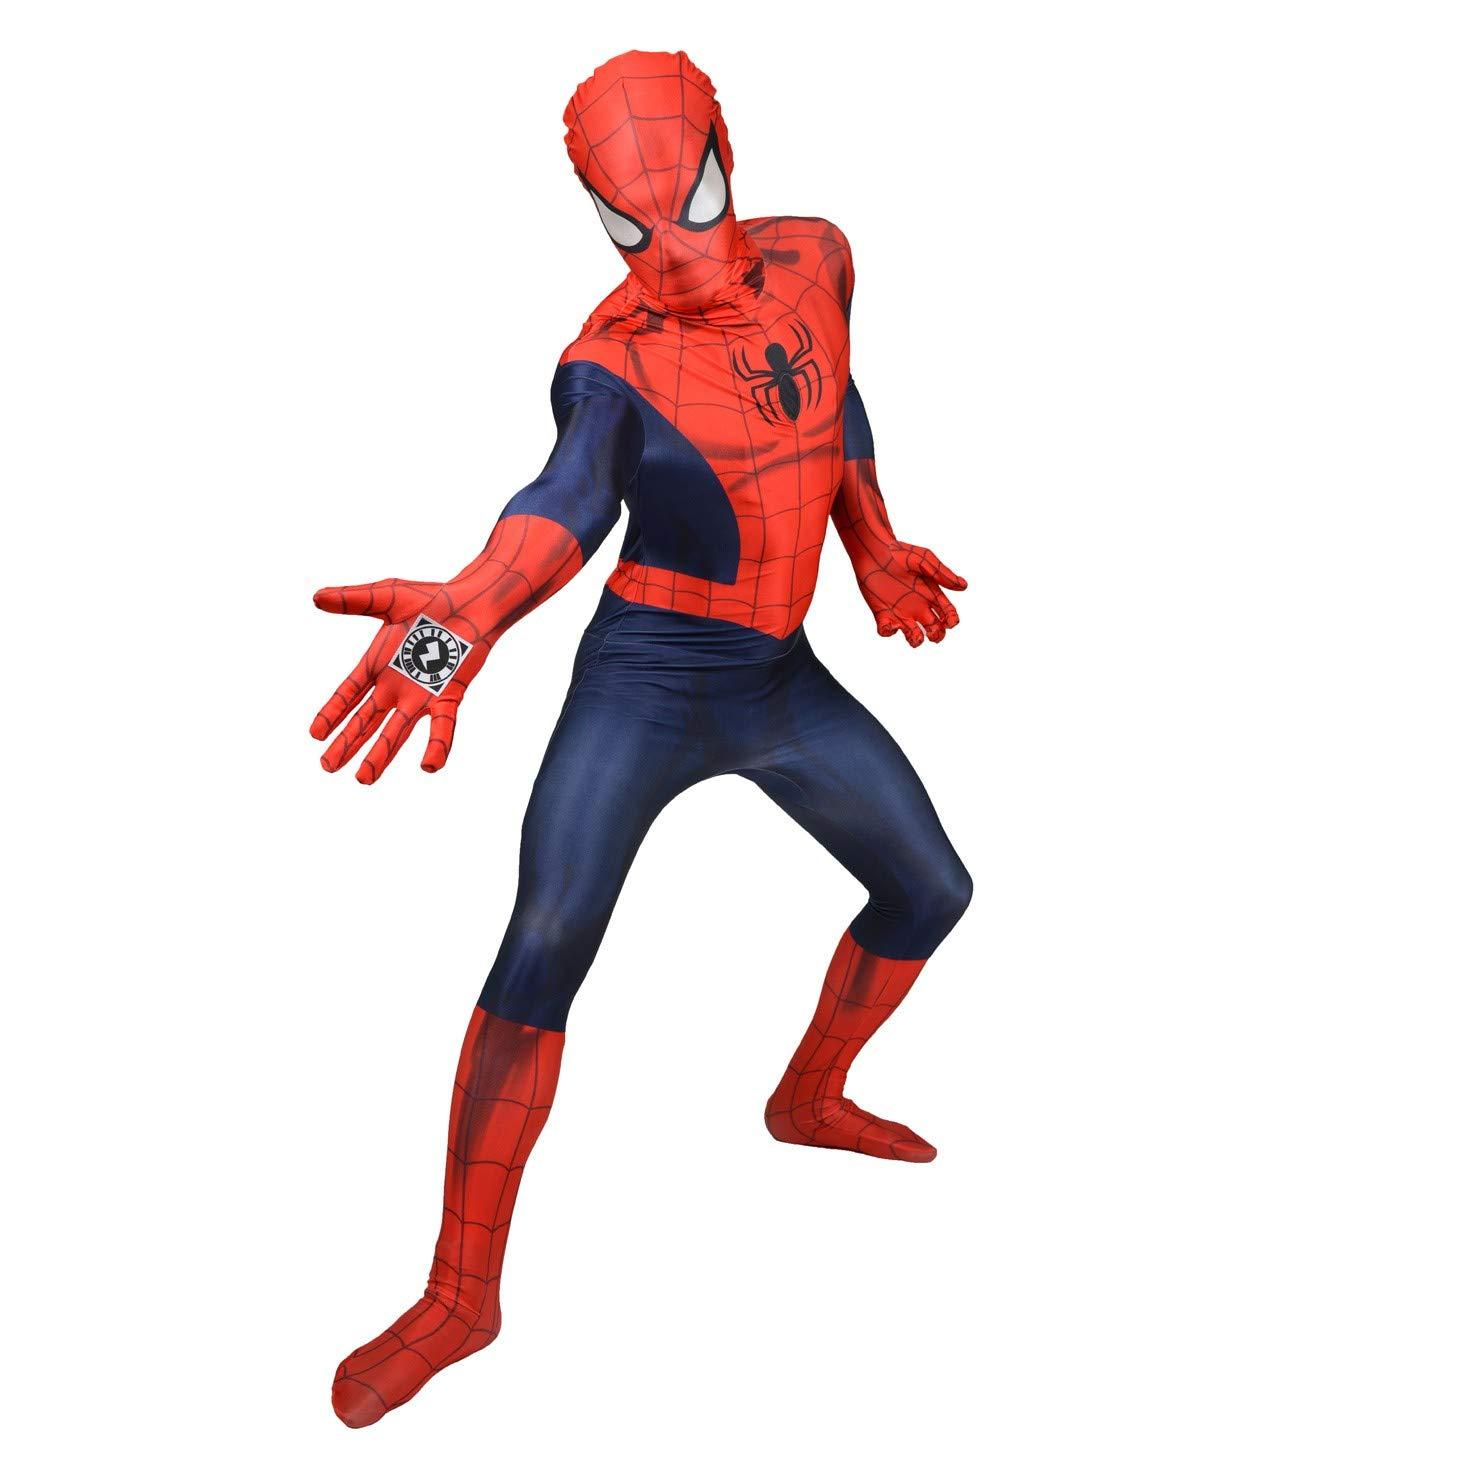 Morphsuits Disfraz de mlsphx 176 – 185 cm oficial Spiderman Homecoming Fancy Dress Disfraz (X-Large)